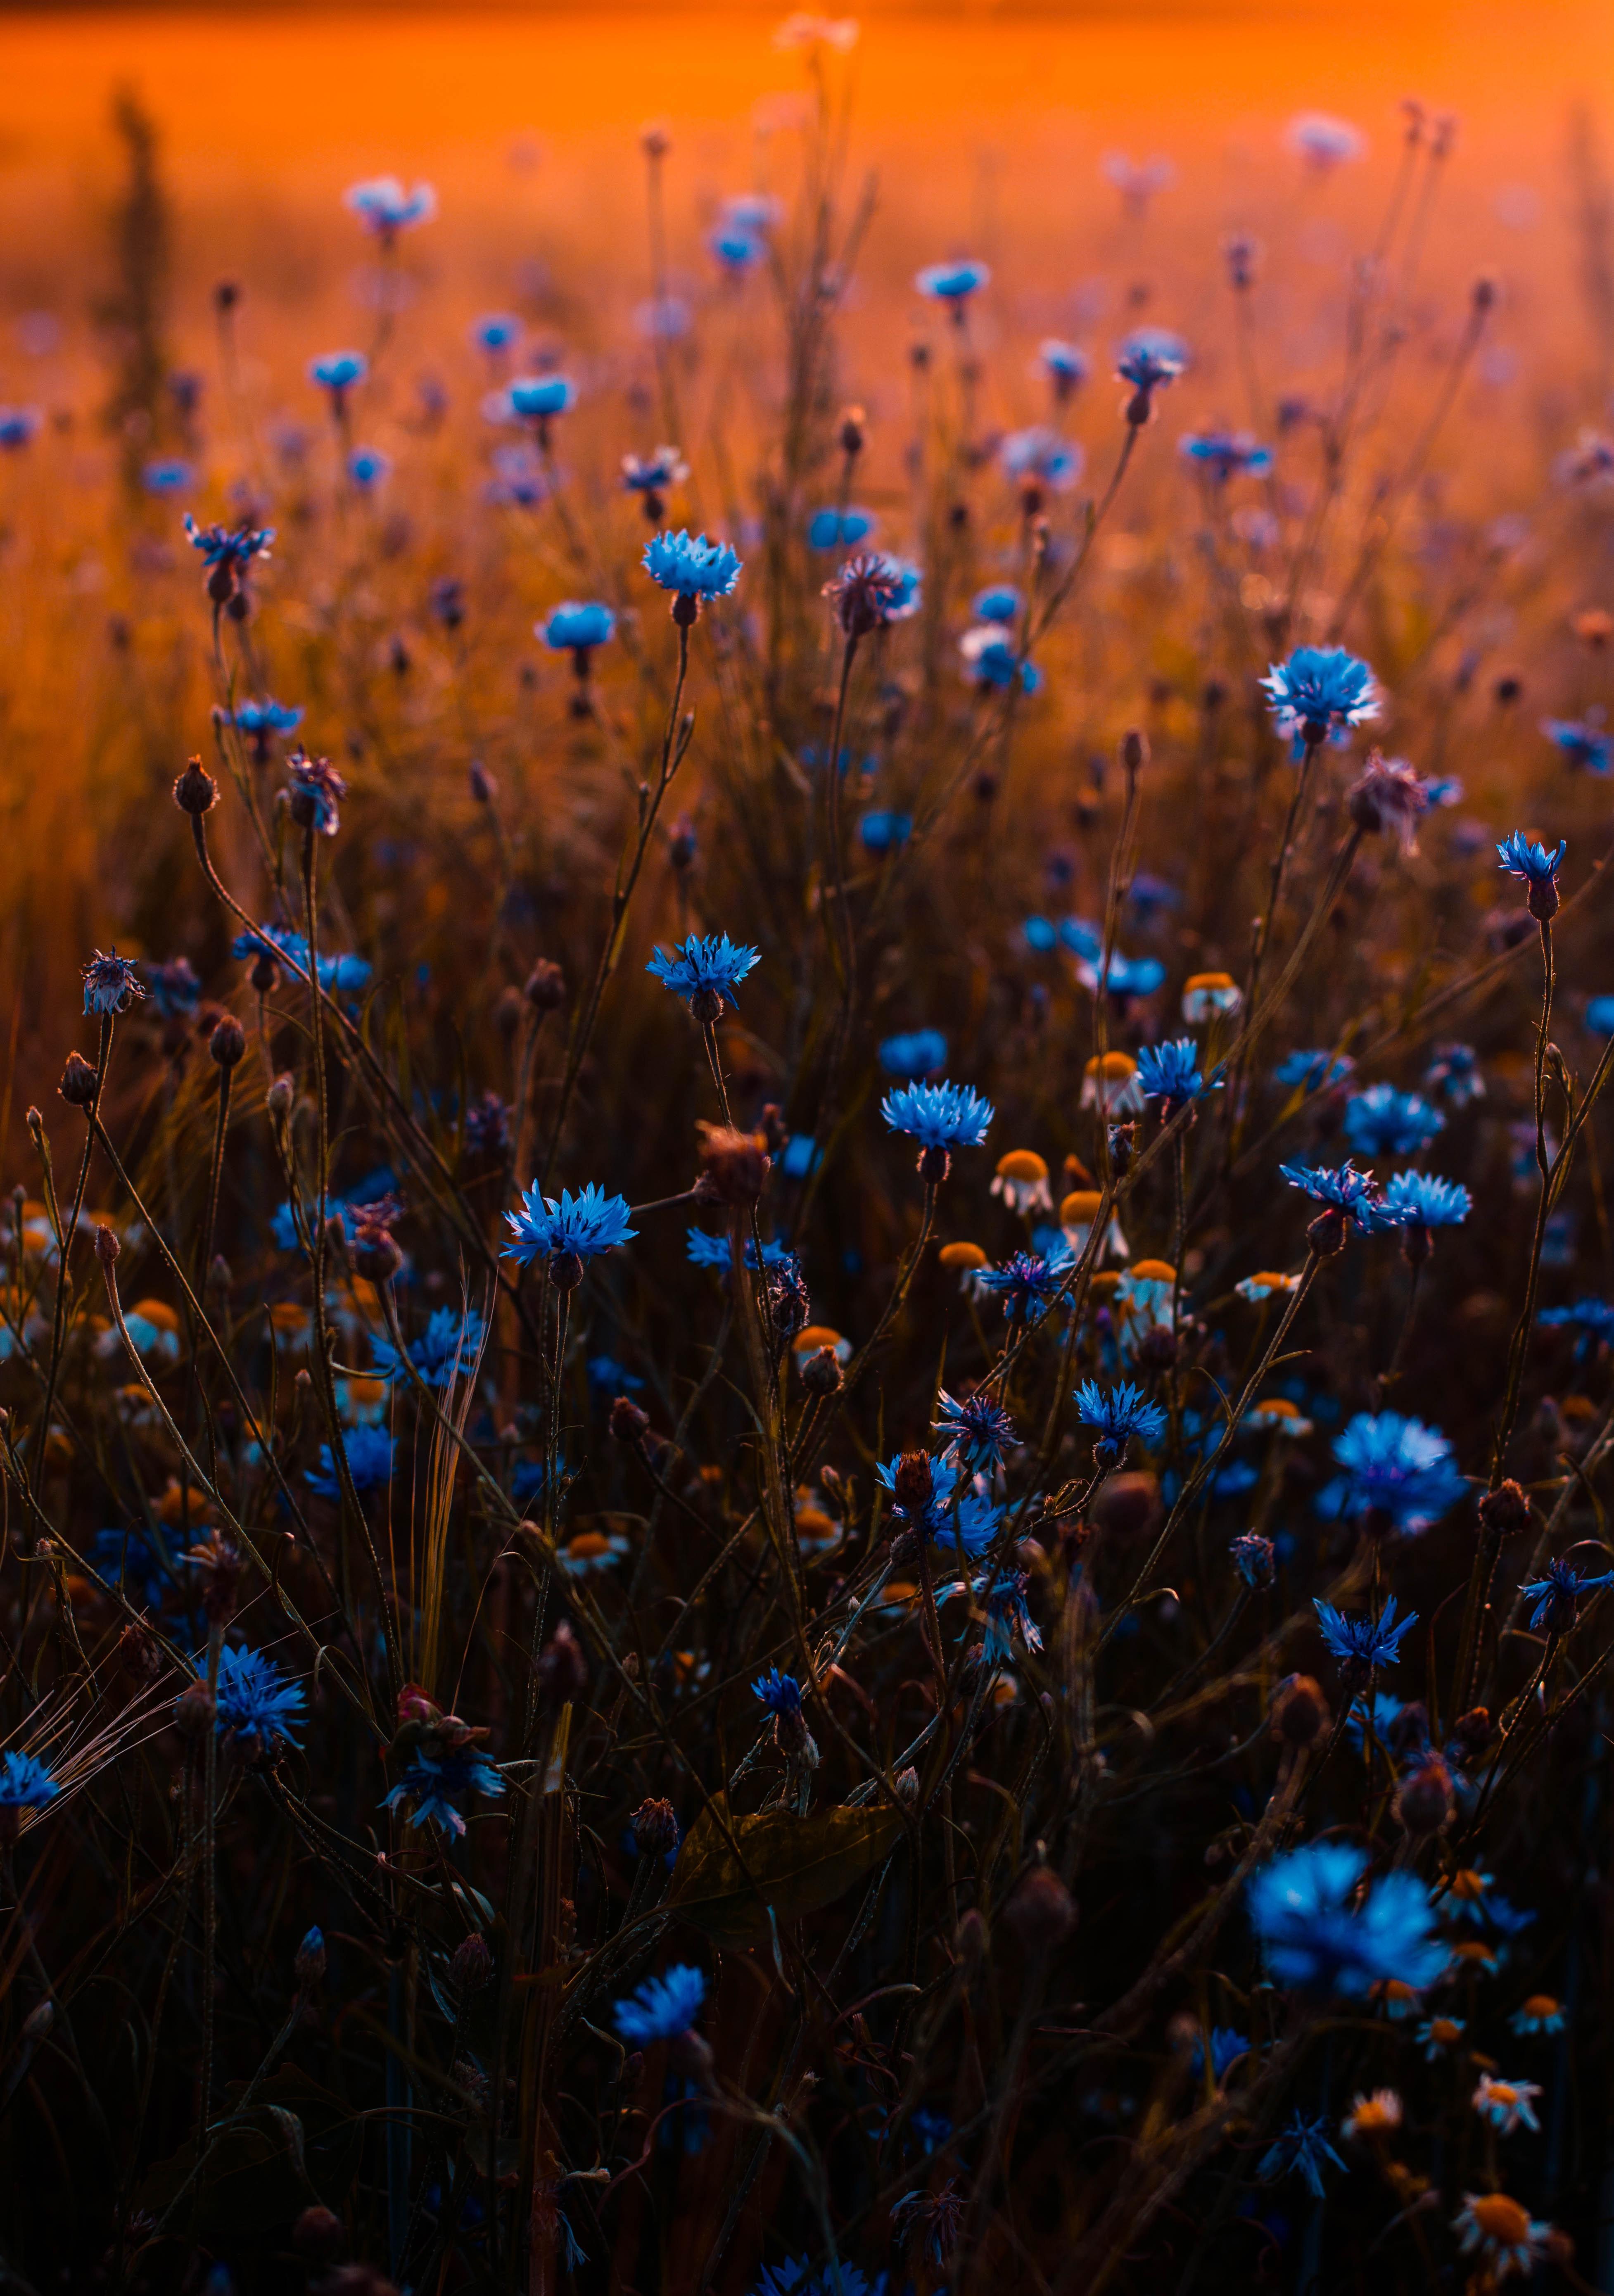 Tilt Shift Lens Photo of Blue Flowers, Blue flowers, Outdoors, Nature, Mother nature, HQ Photo